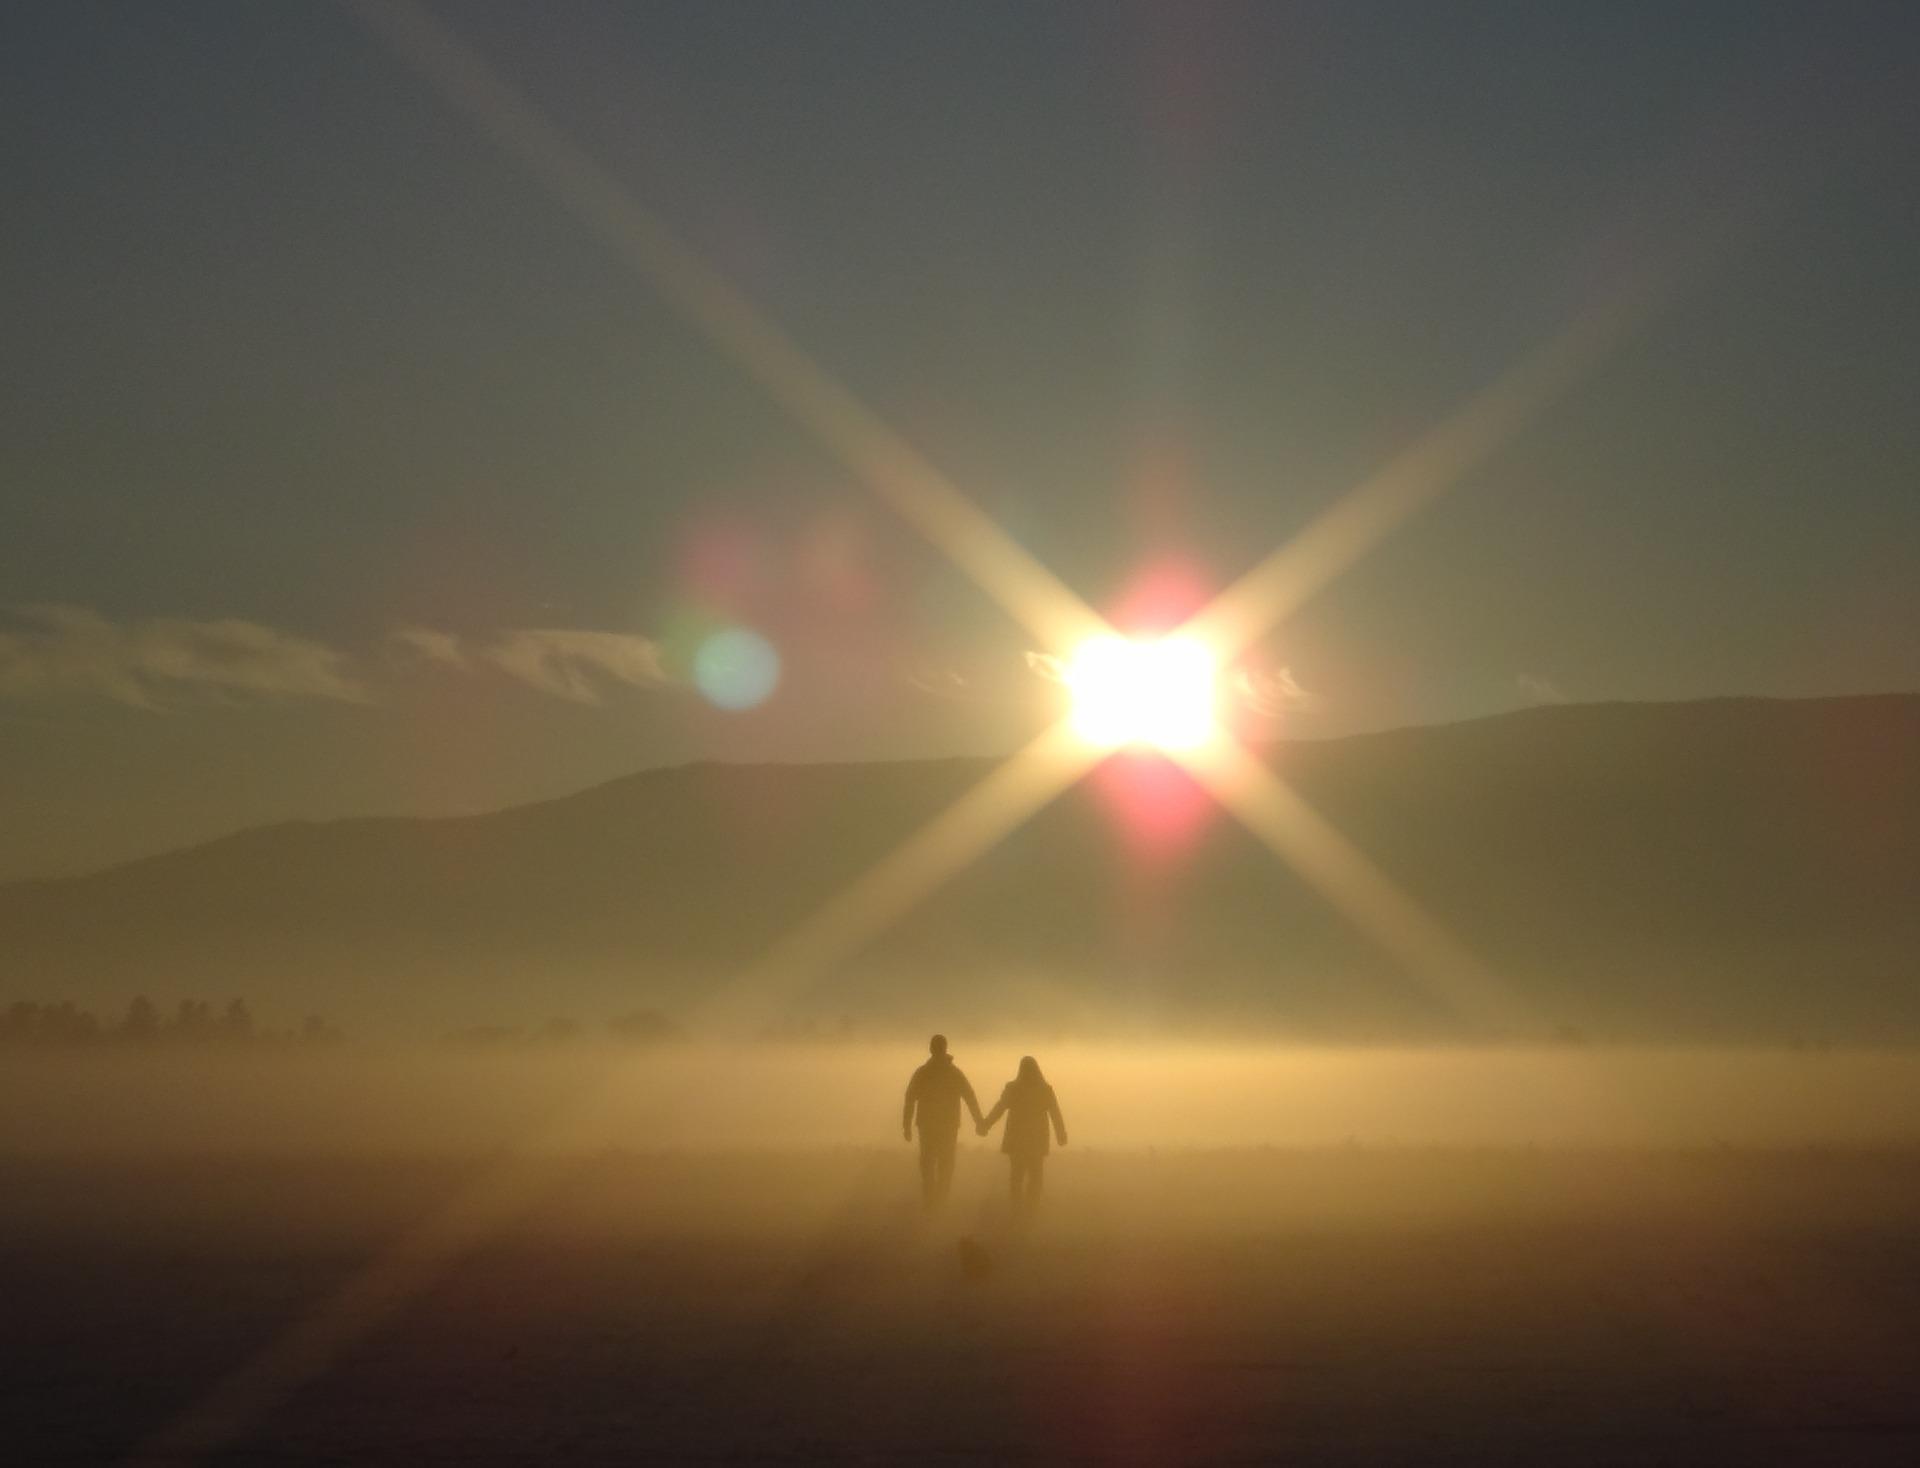 sunset-801933_1920.jpg